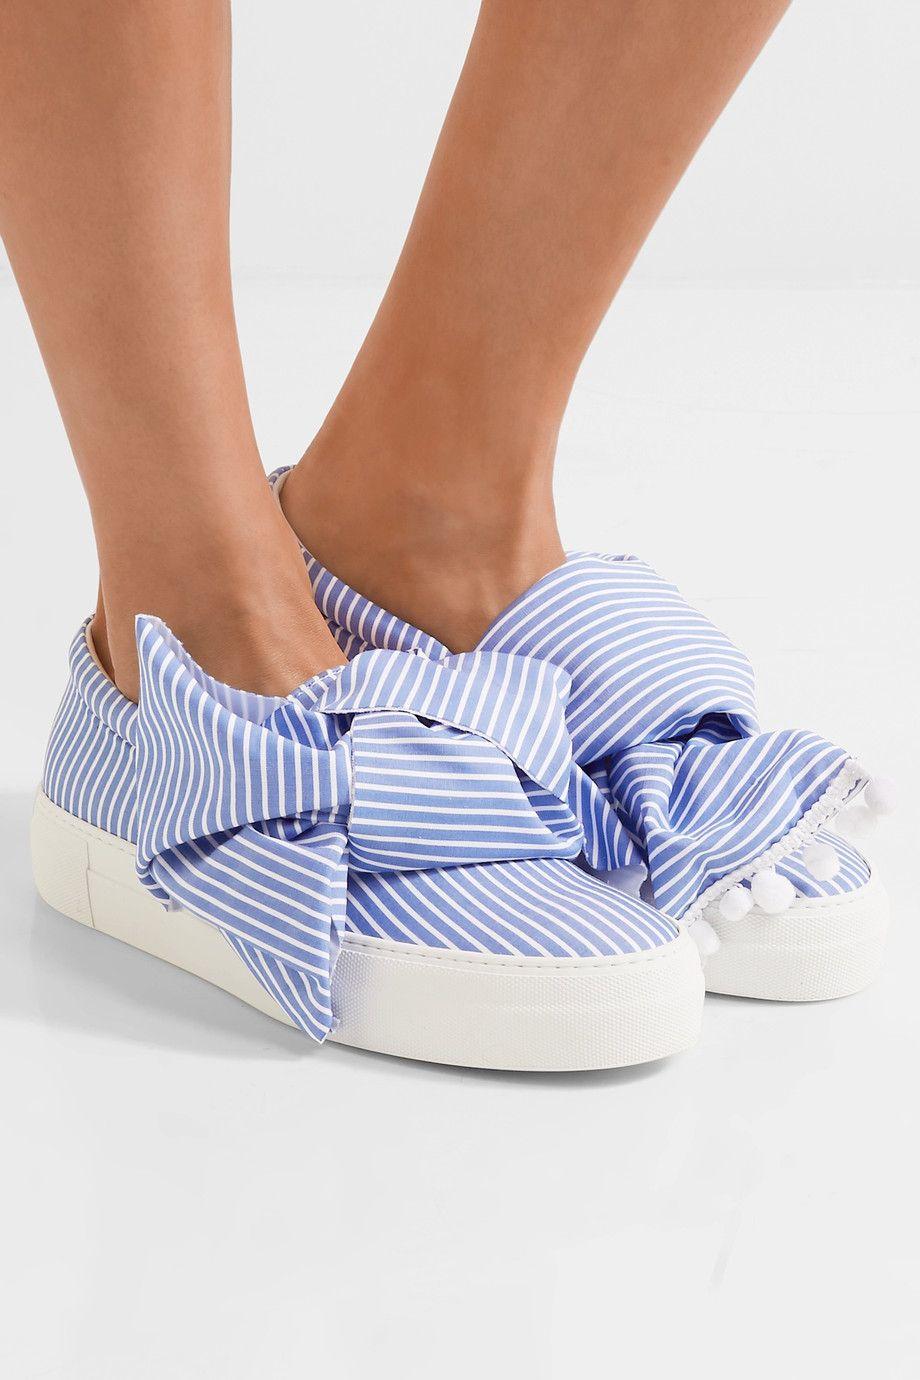 À Mode De Paires 140 Chaussures Noeuds TendancesTendance SzUMVp